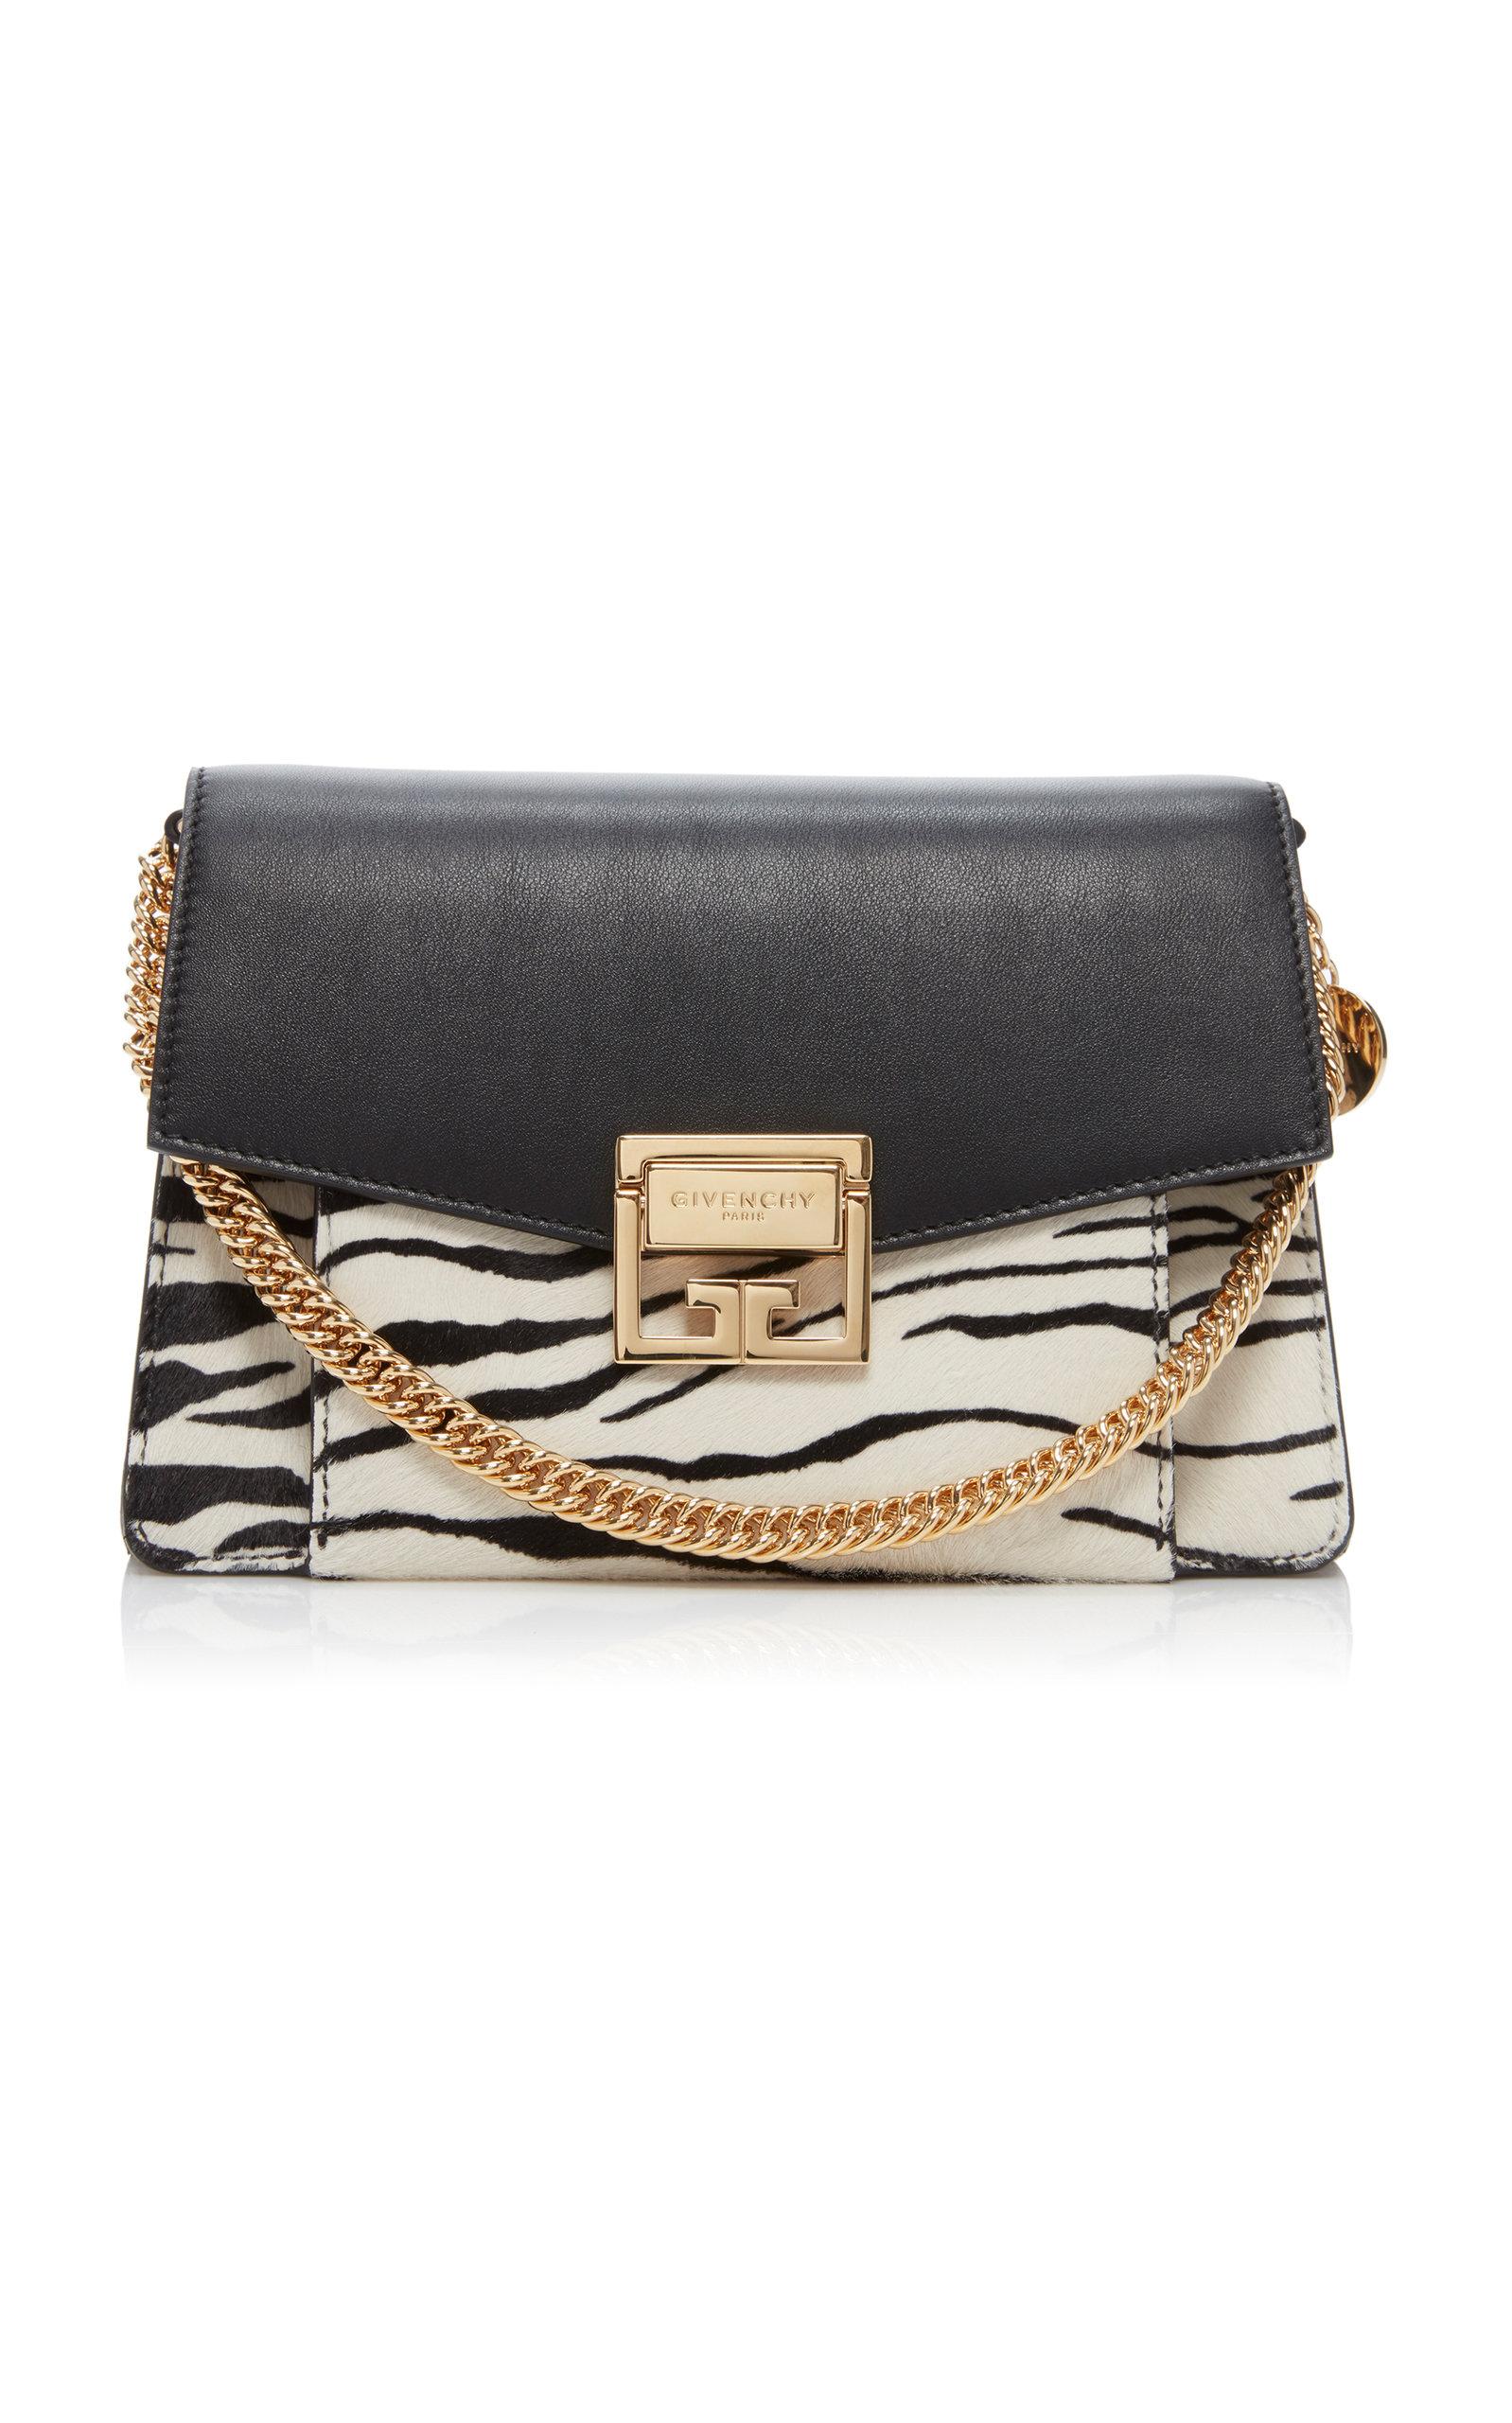 Givenchy Shoulder GV3 Small Leather and Zebra-Print Calf Hair Shoulder Bag